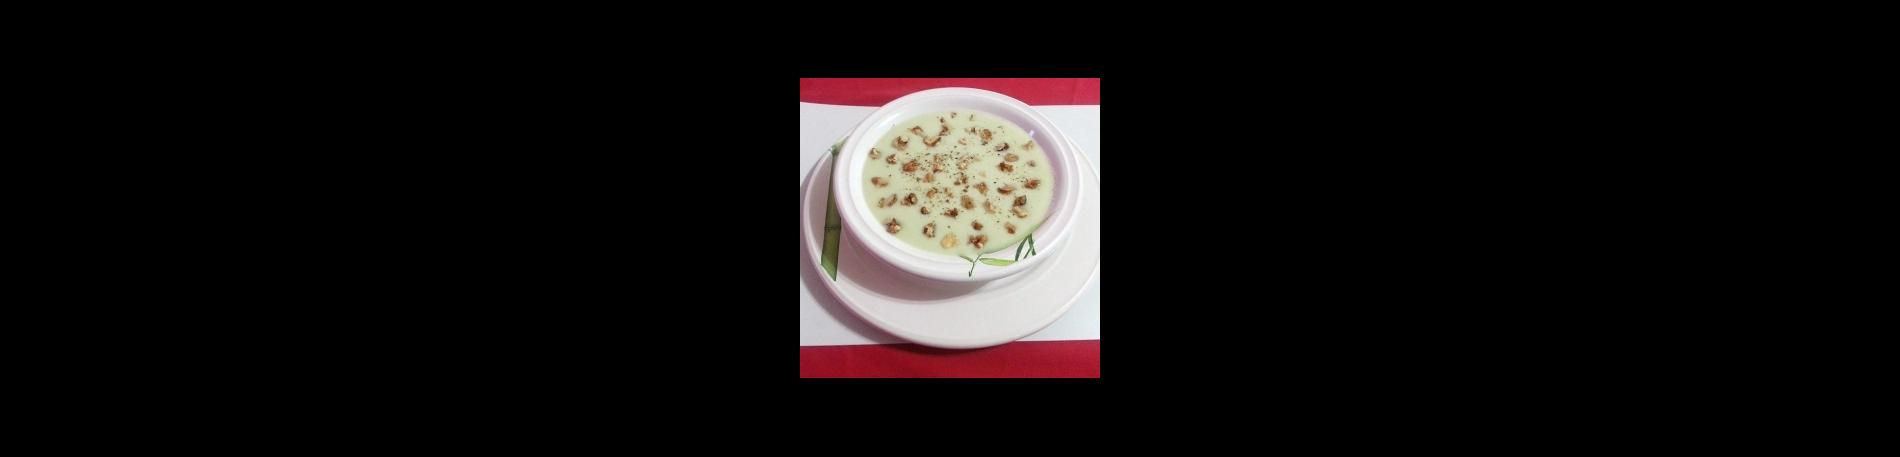 Sopa fría de papa blanca con leche de coco